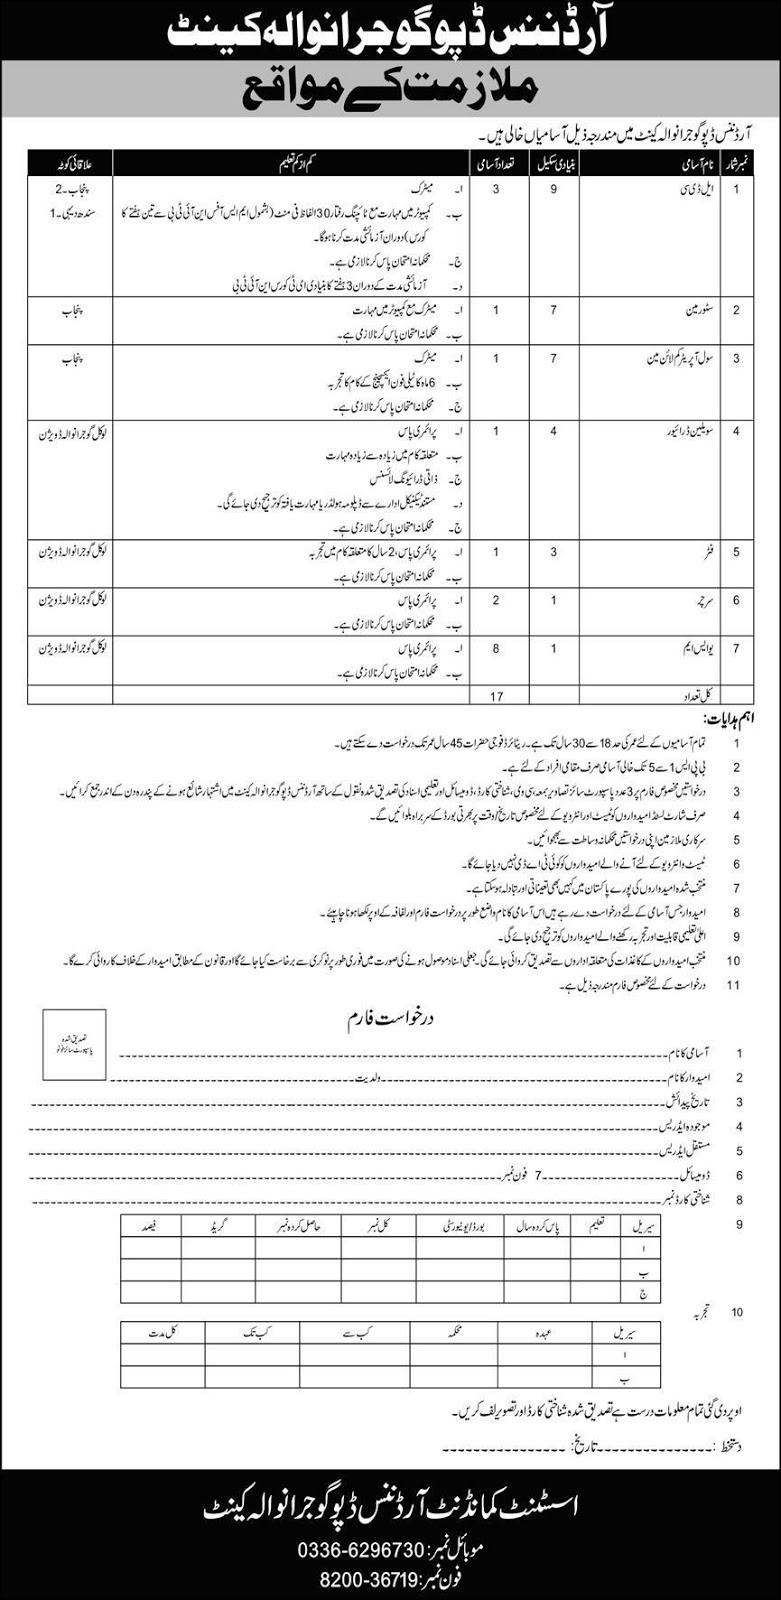 Pakistan Army Ordnance Depot Cantt Jobs 2020 | Multiple Jobs